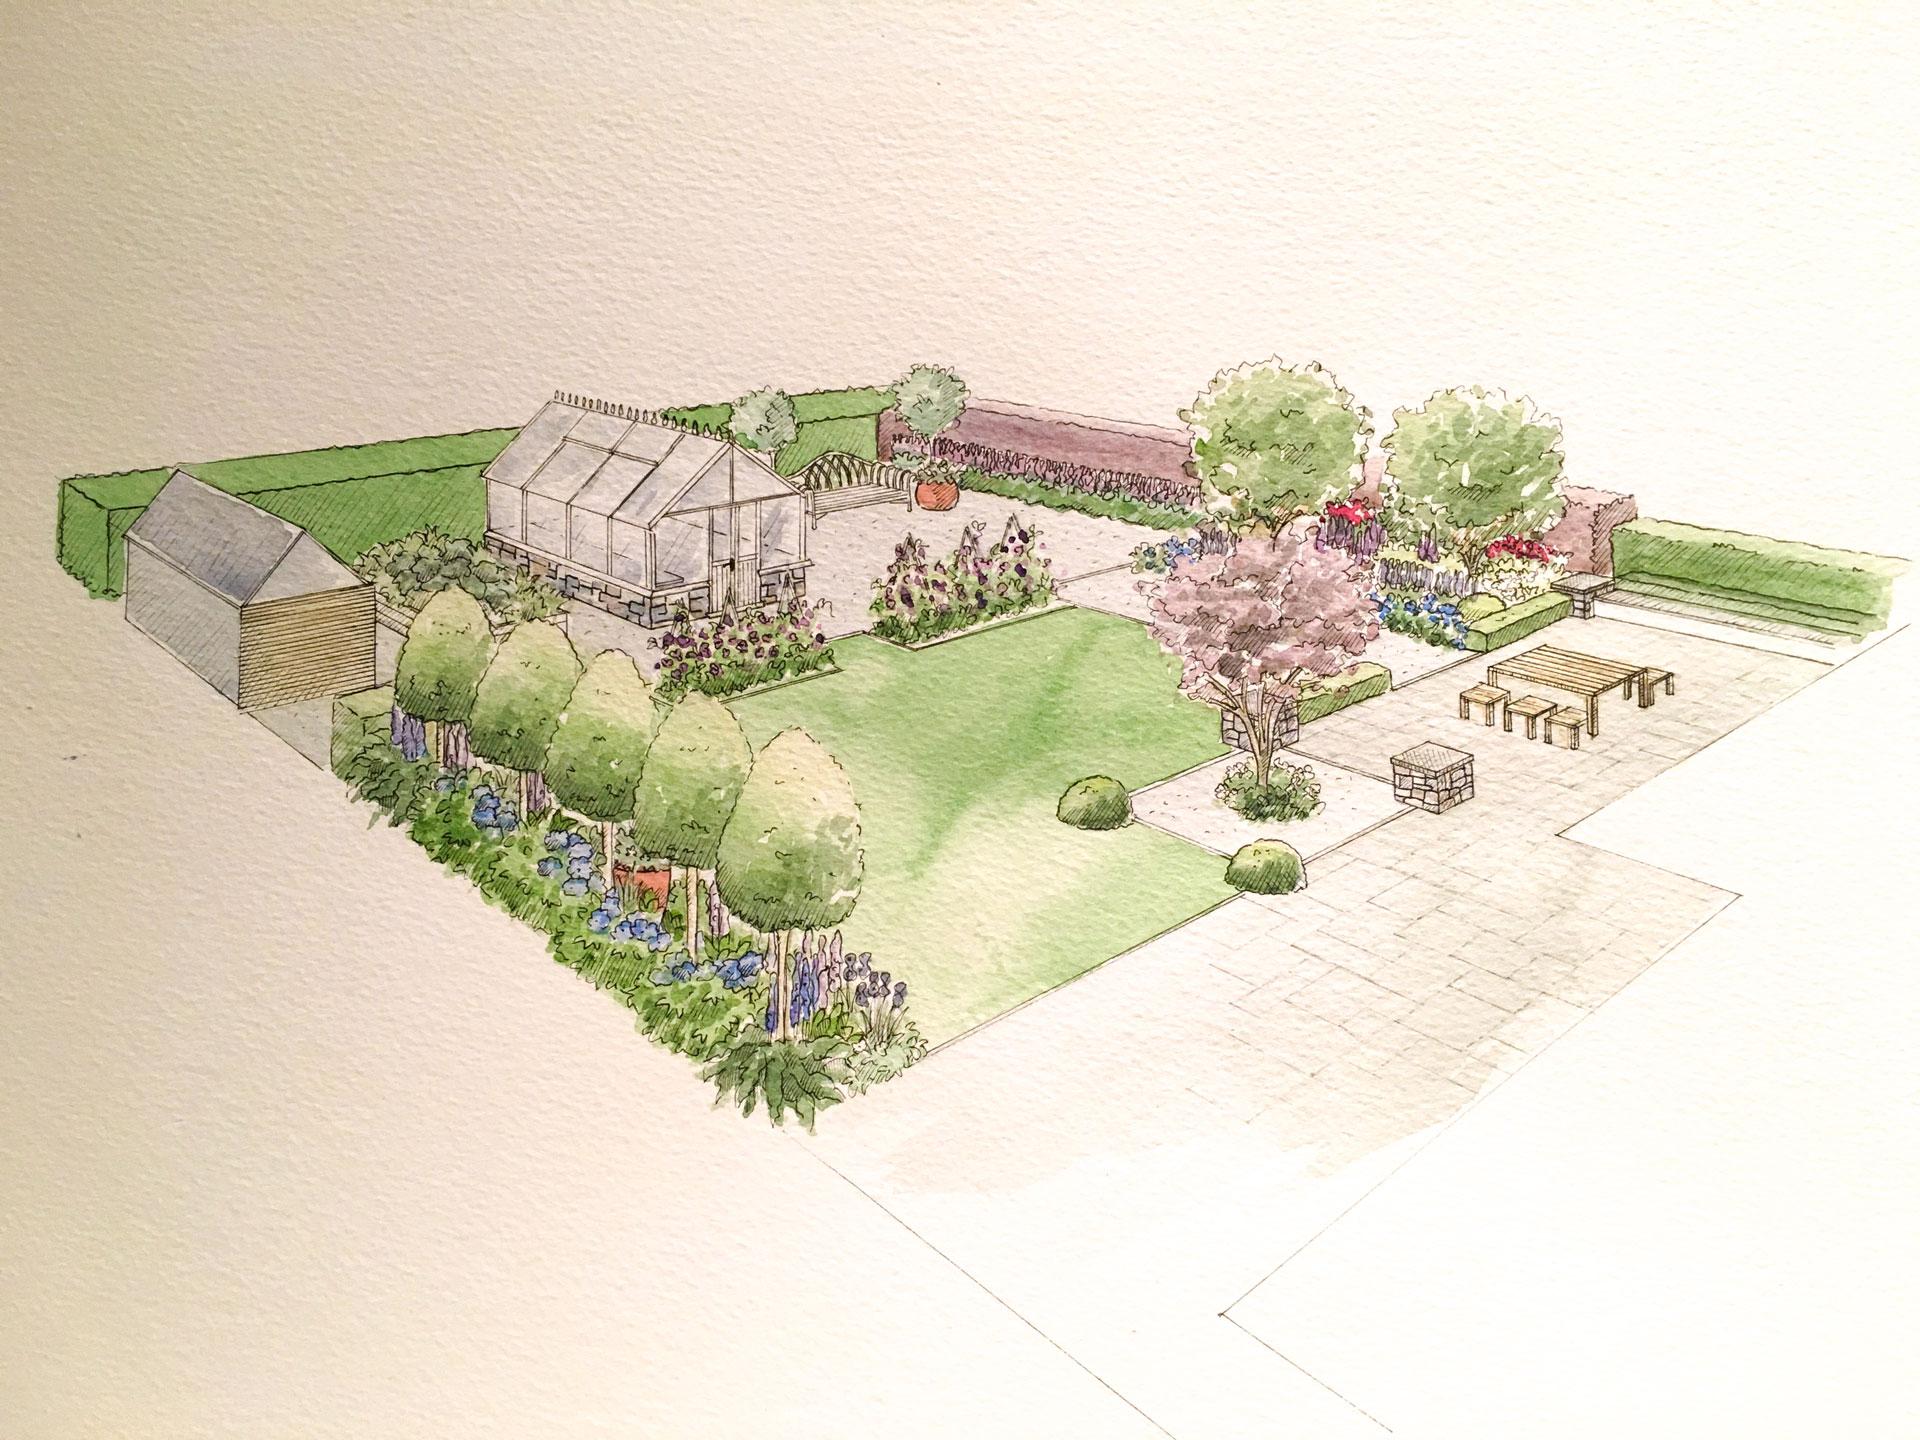 Garden Design with Greenhouse